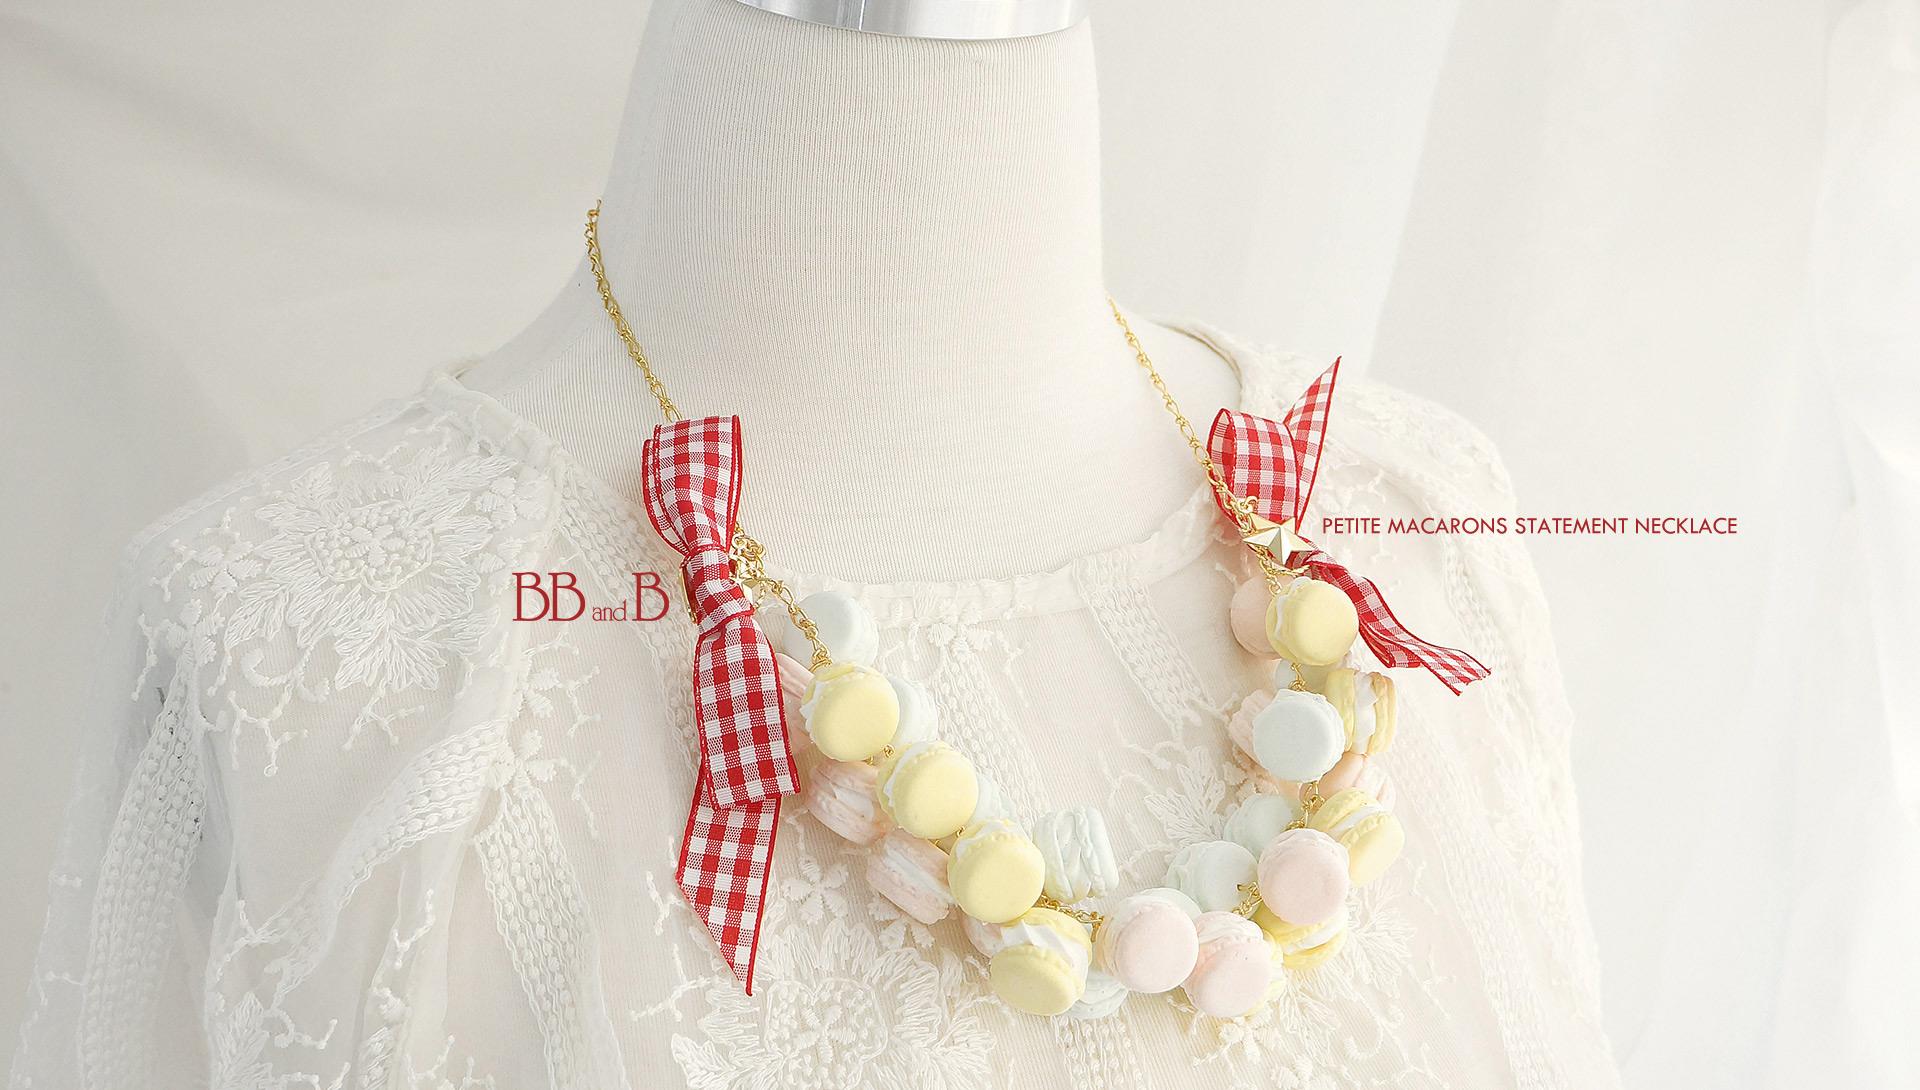 Petite Macarons Statement Necklace